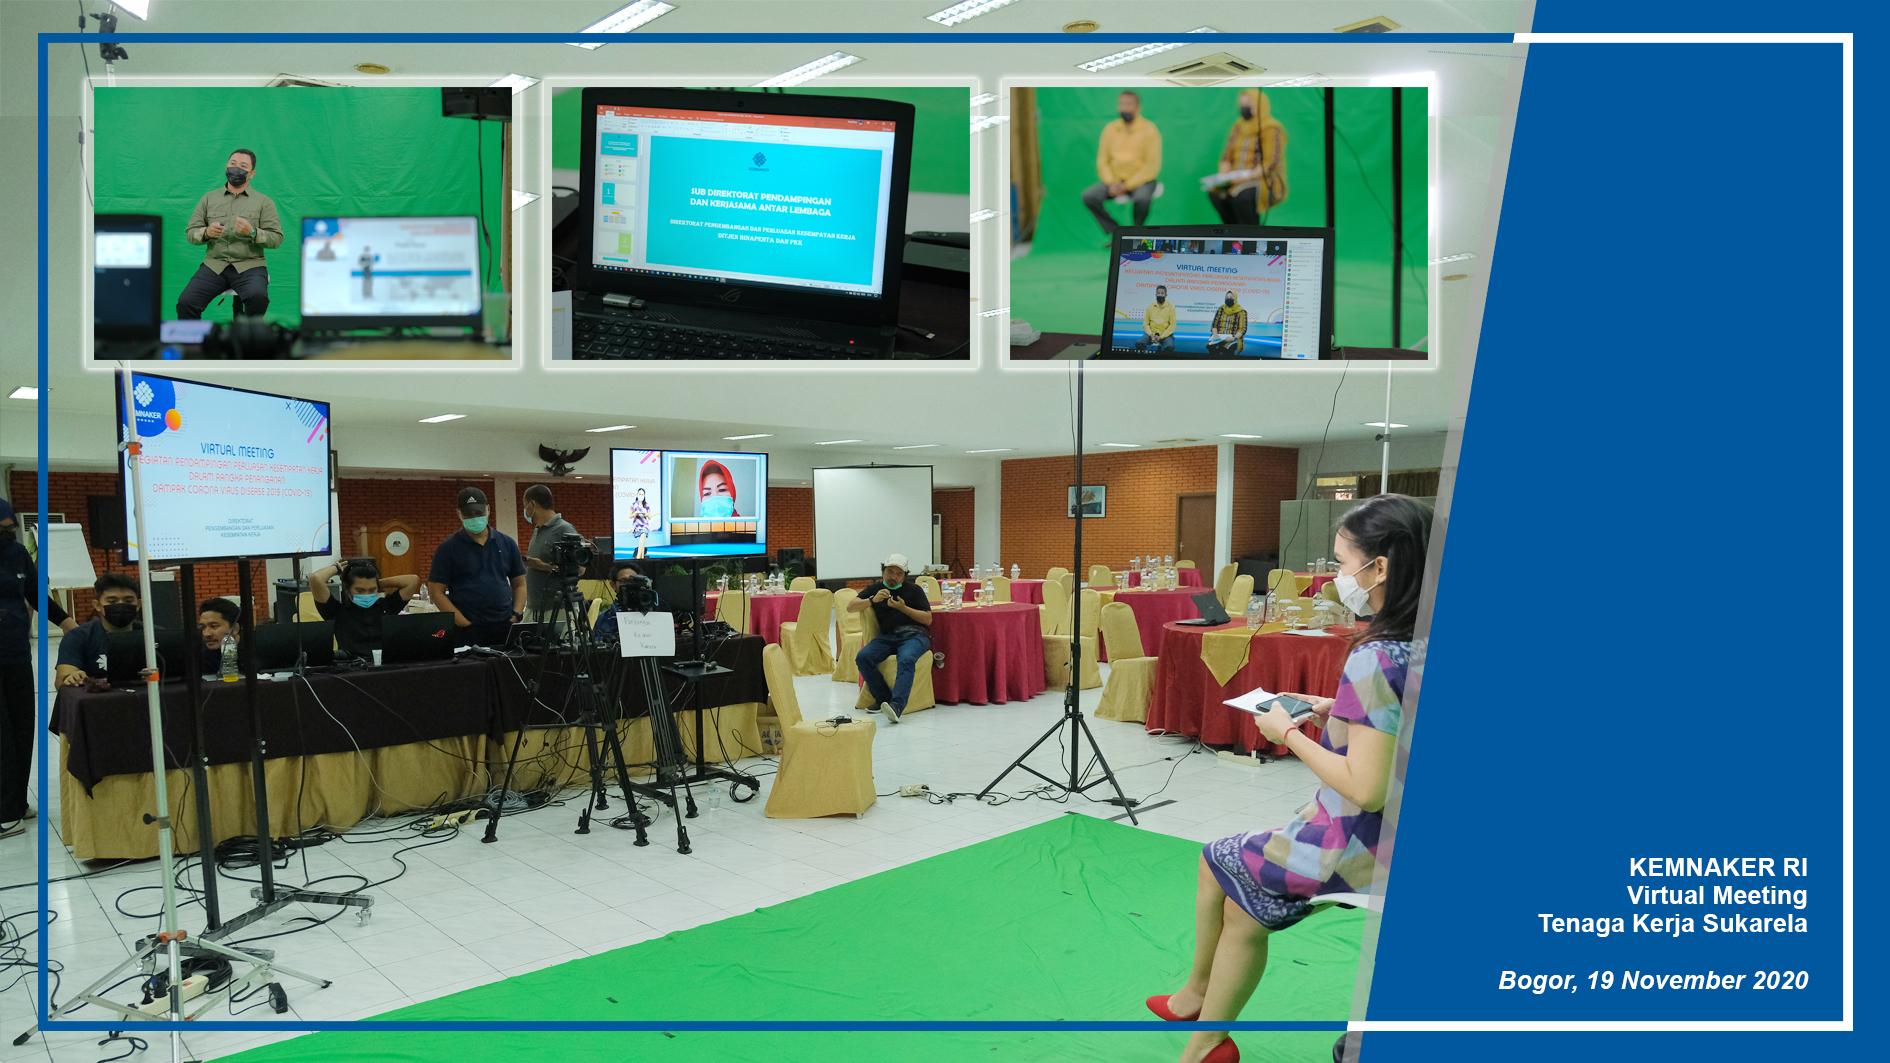 Virtual Meeting Tenaga Kerja Sukarela Kemnaker